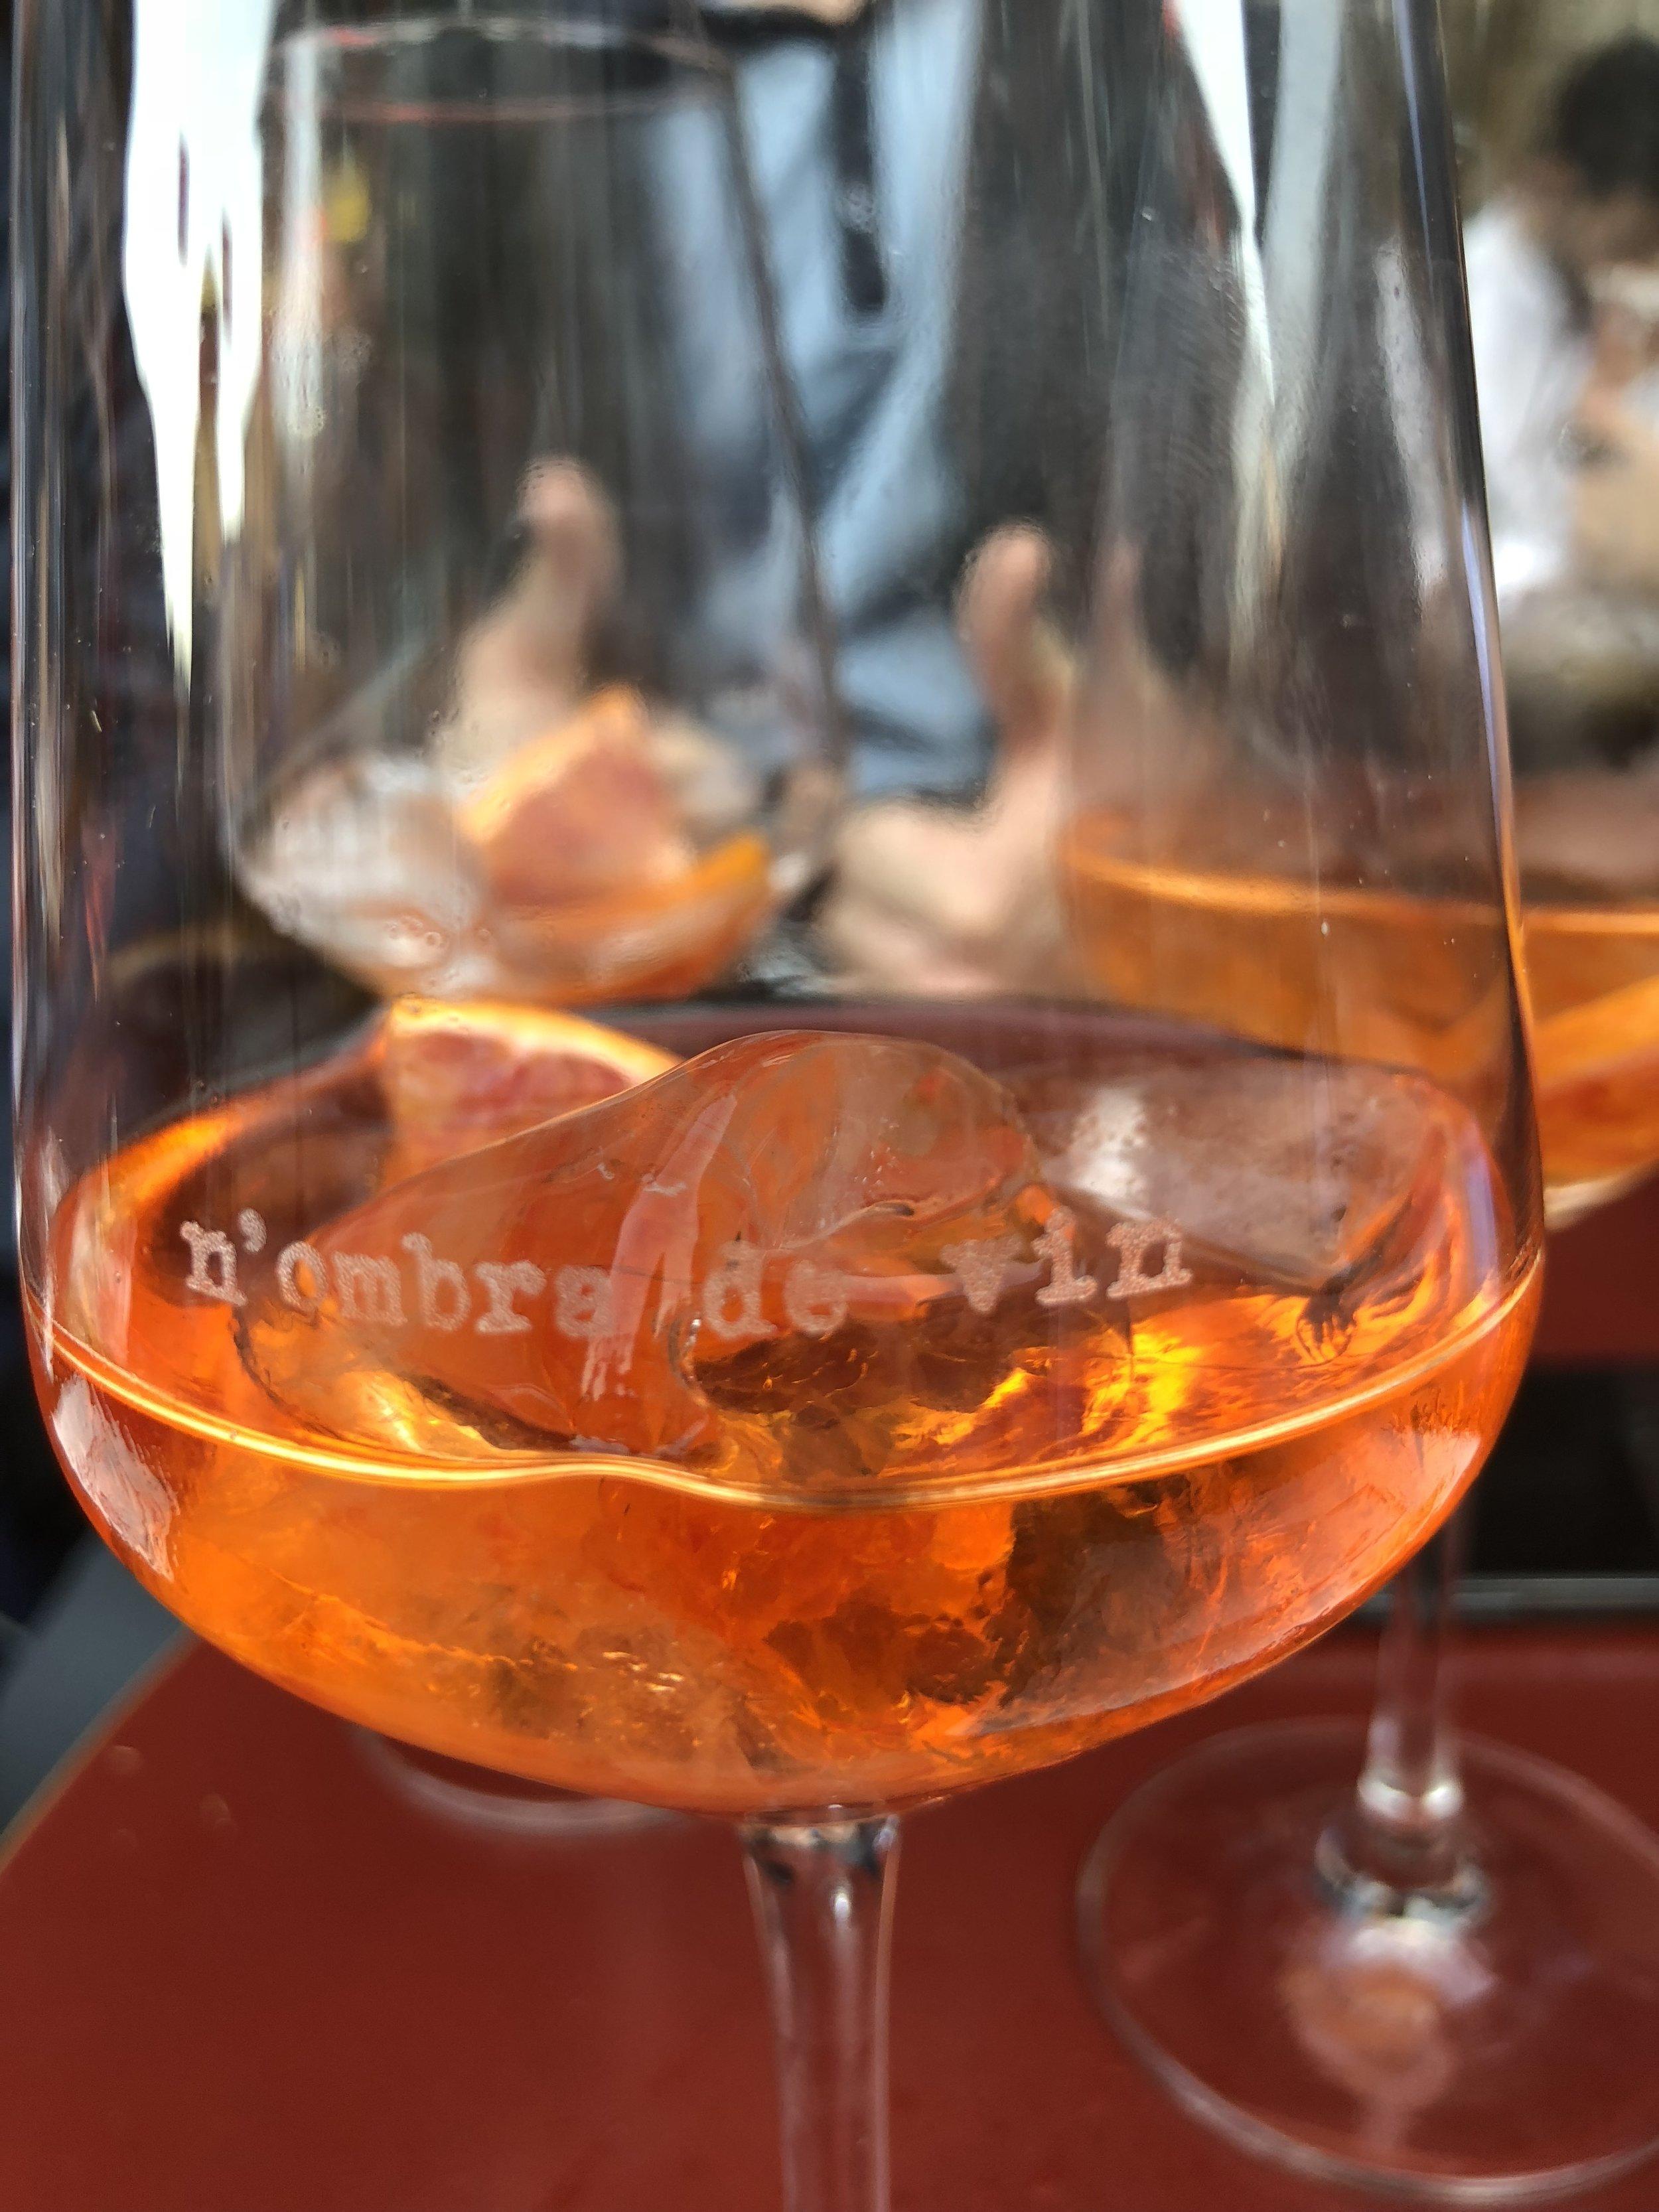 The perfect Spritz at Nombra de Vin